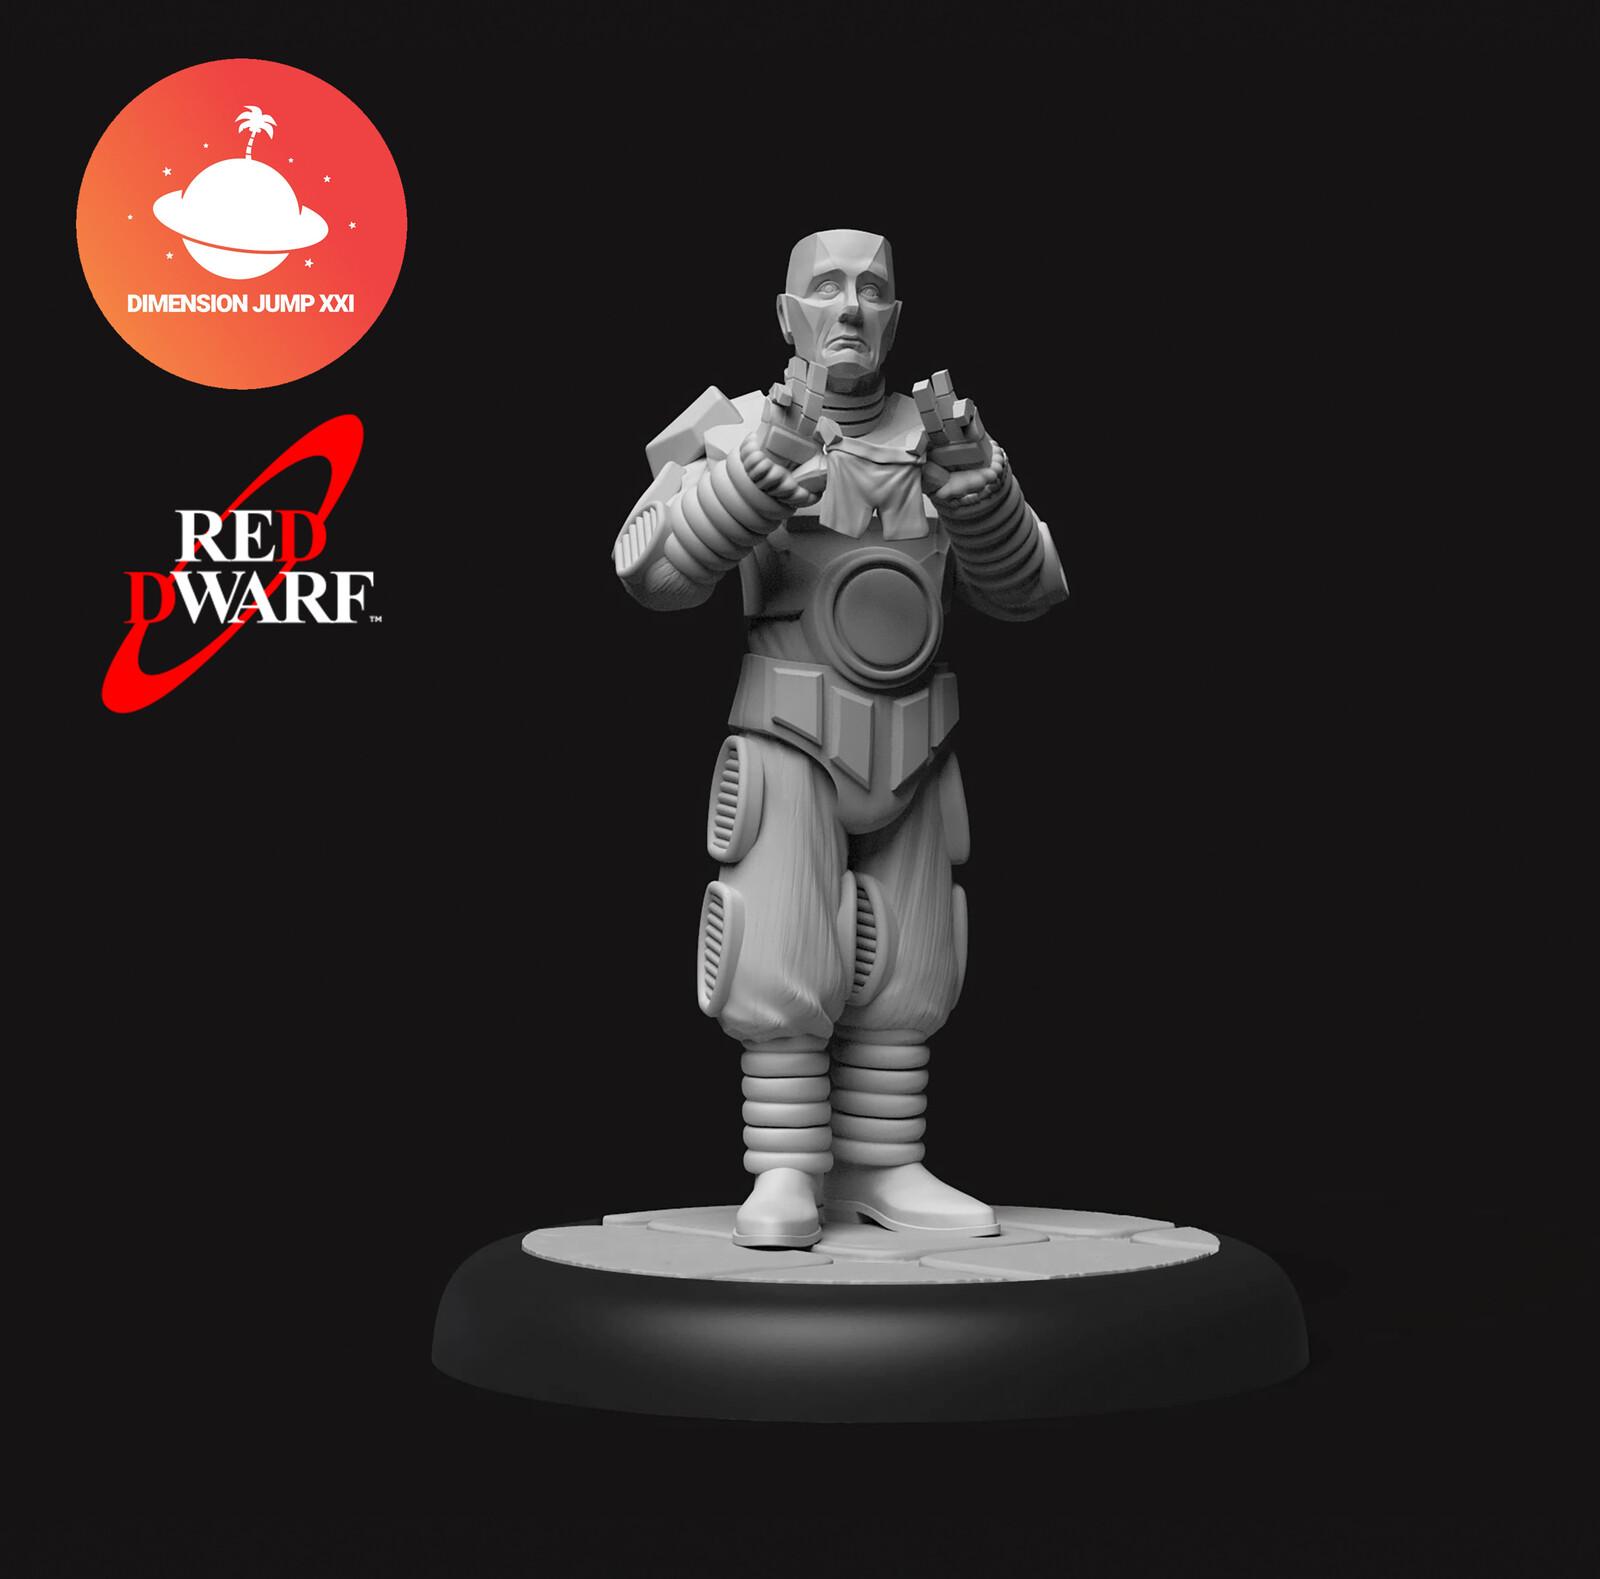 Red Dwarf DJXXI Minis - Kryten